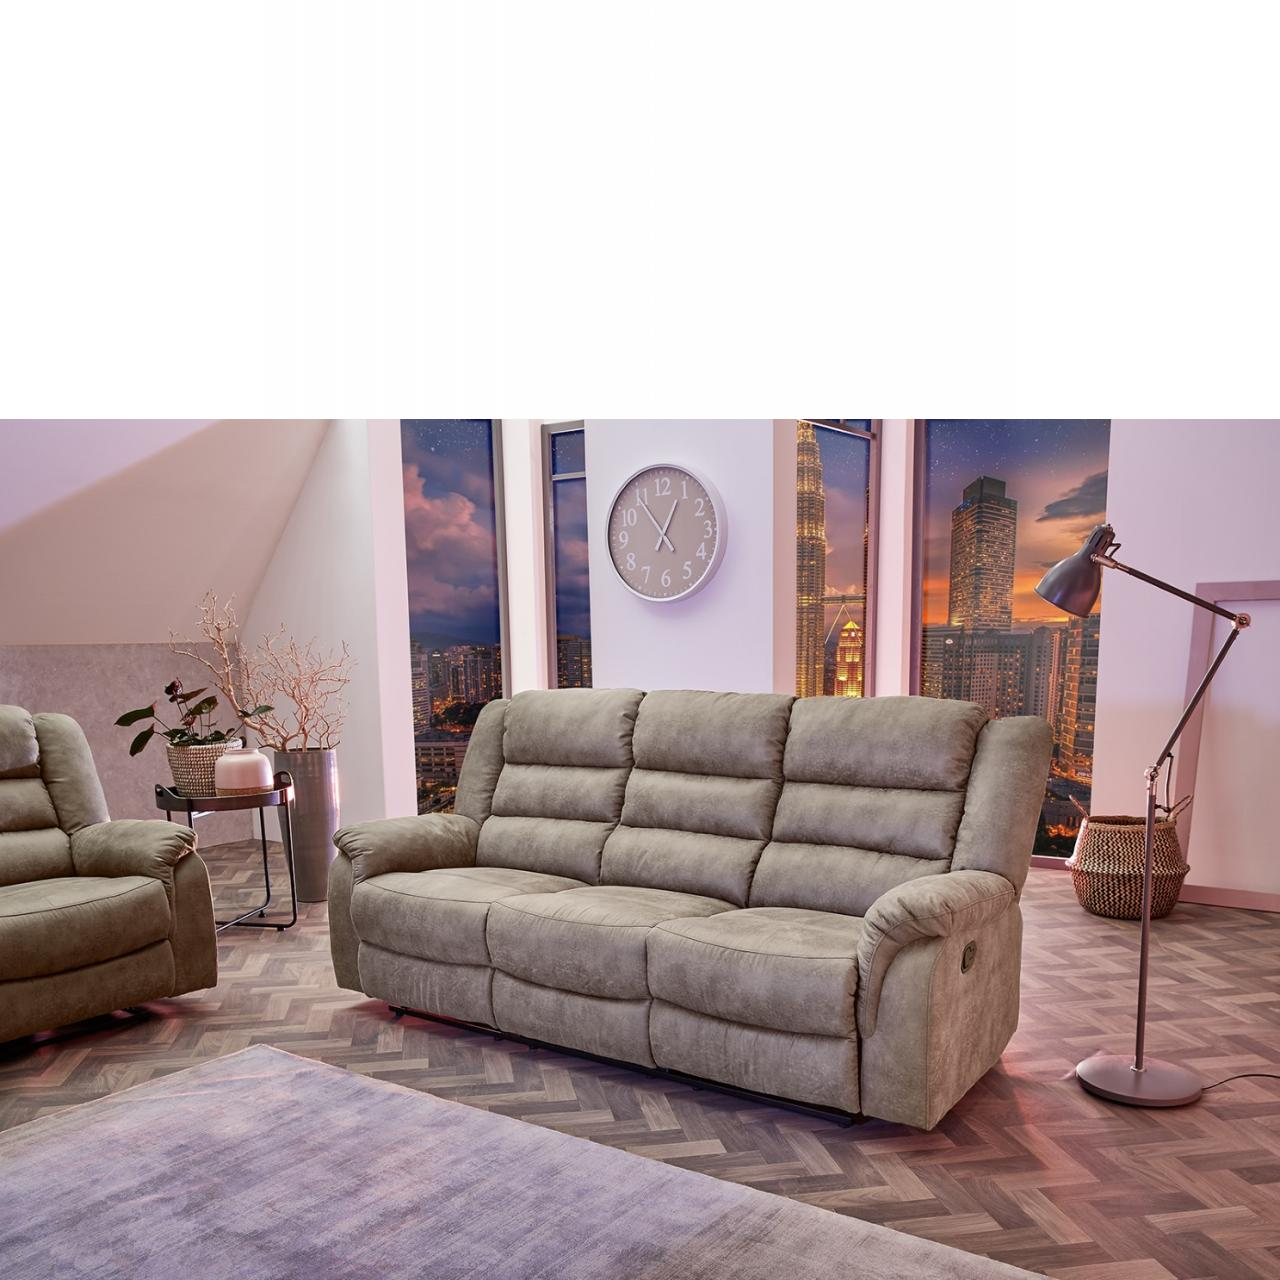 3er Sofa Cleveland 3 in Vintage grau-braun